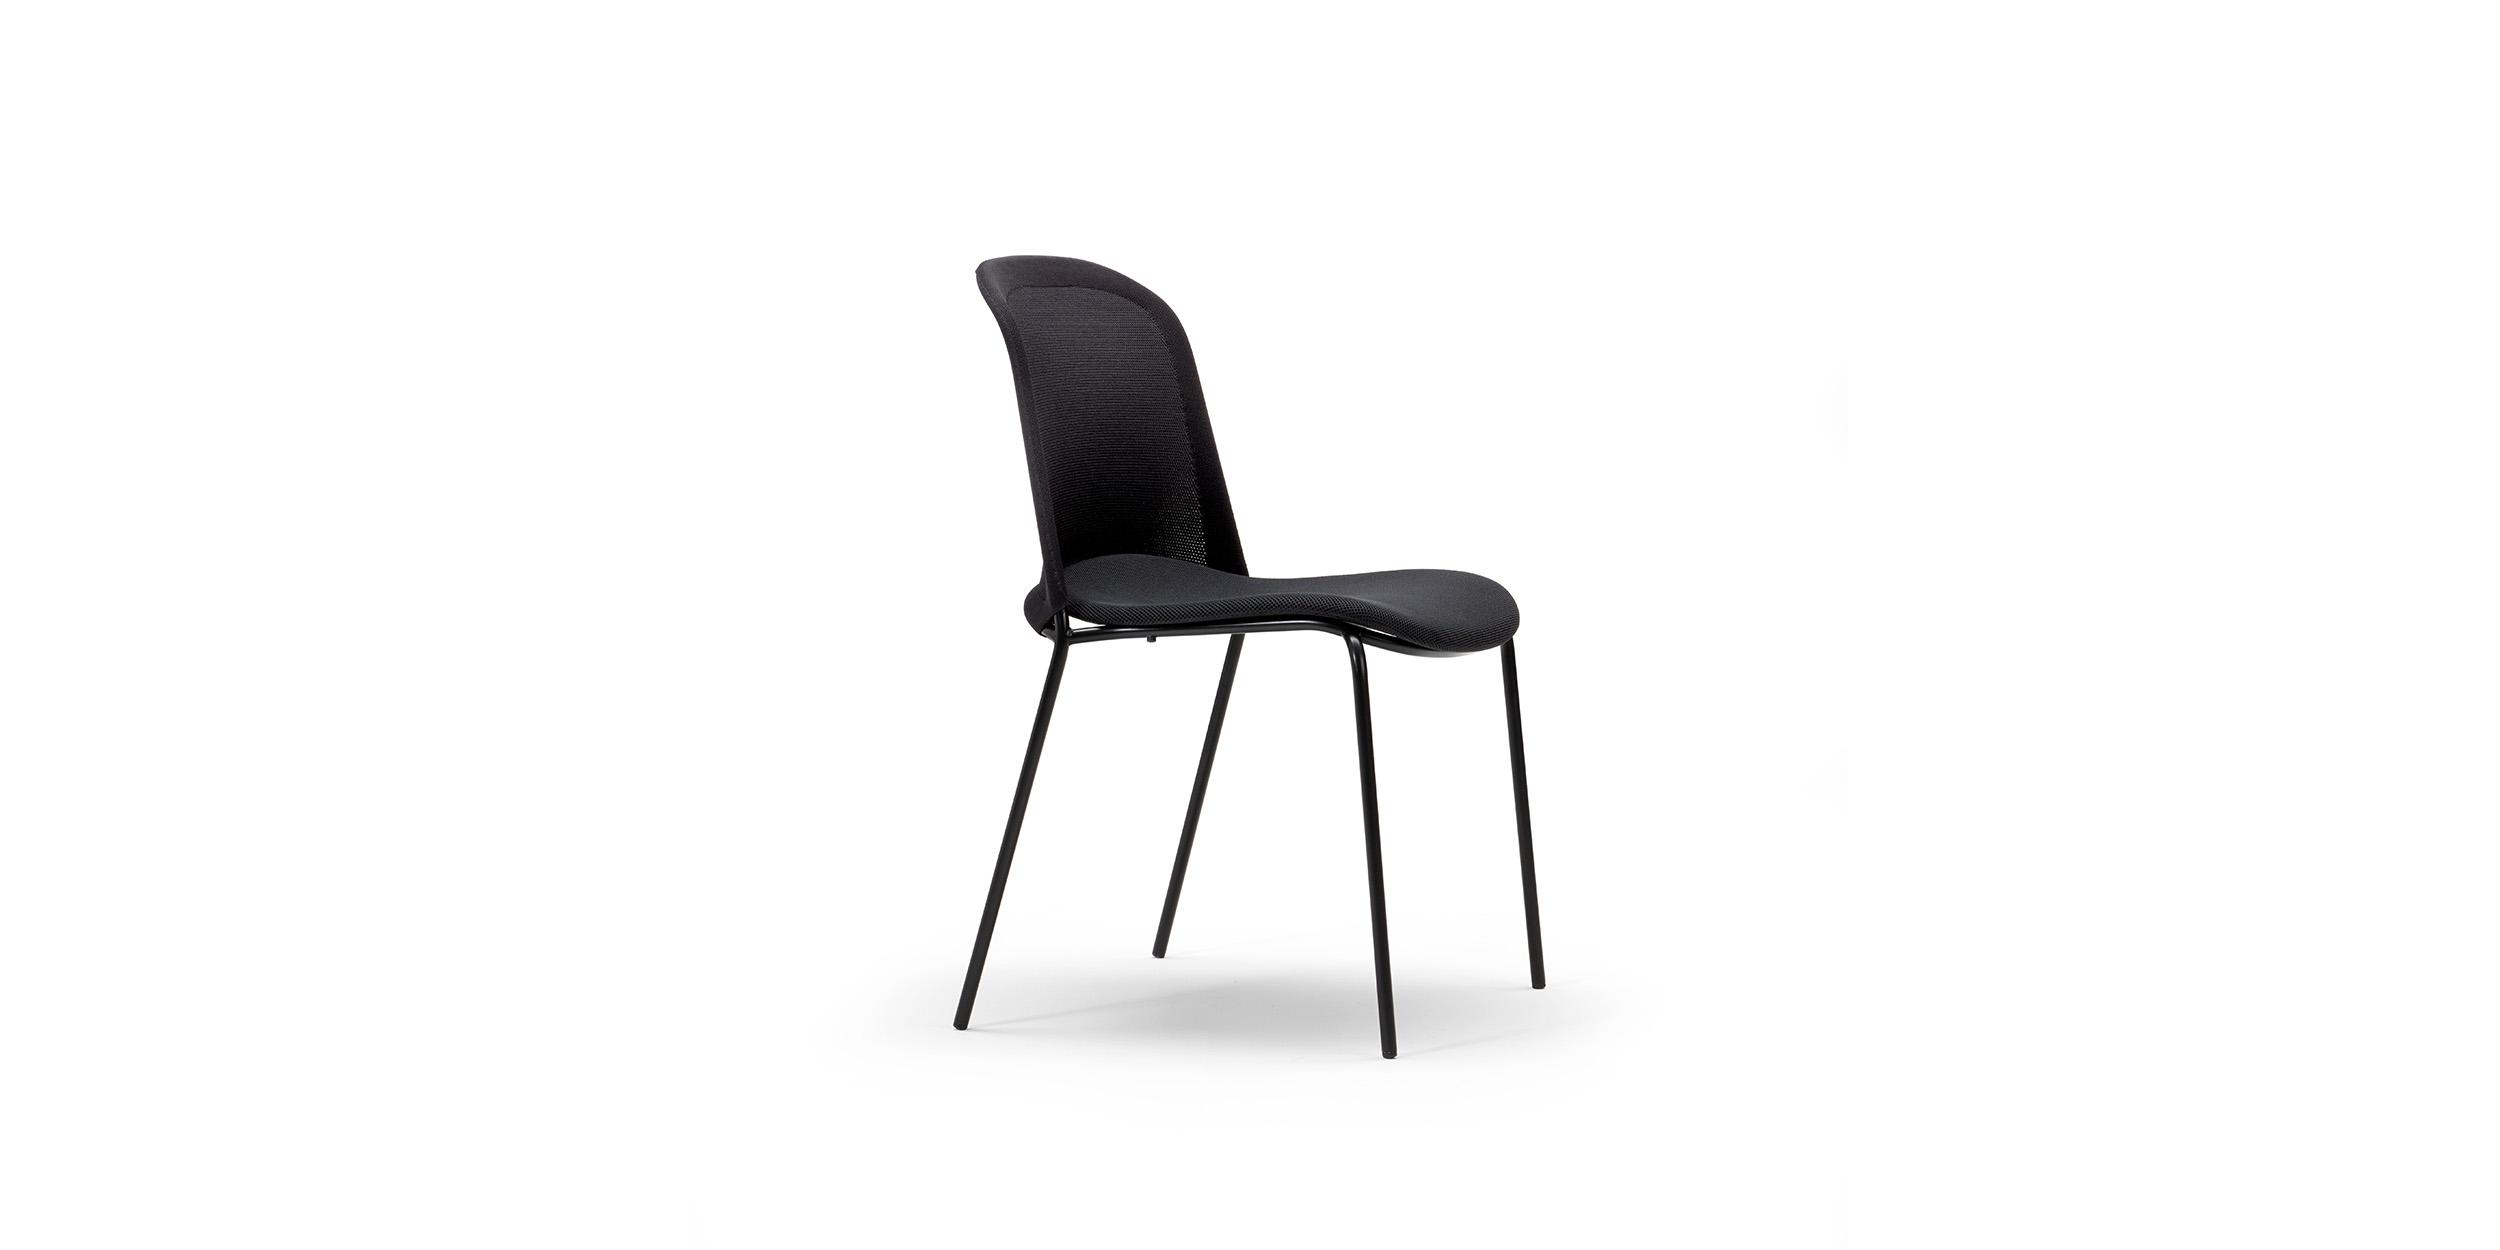 Sheer, Chair by Monica Förster